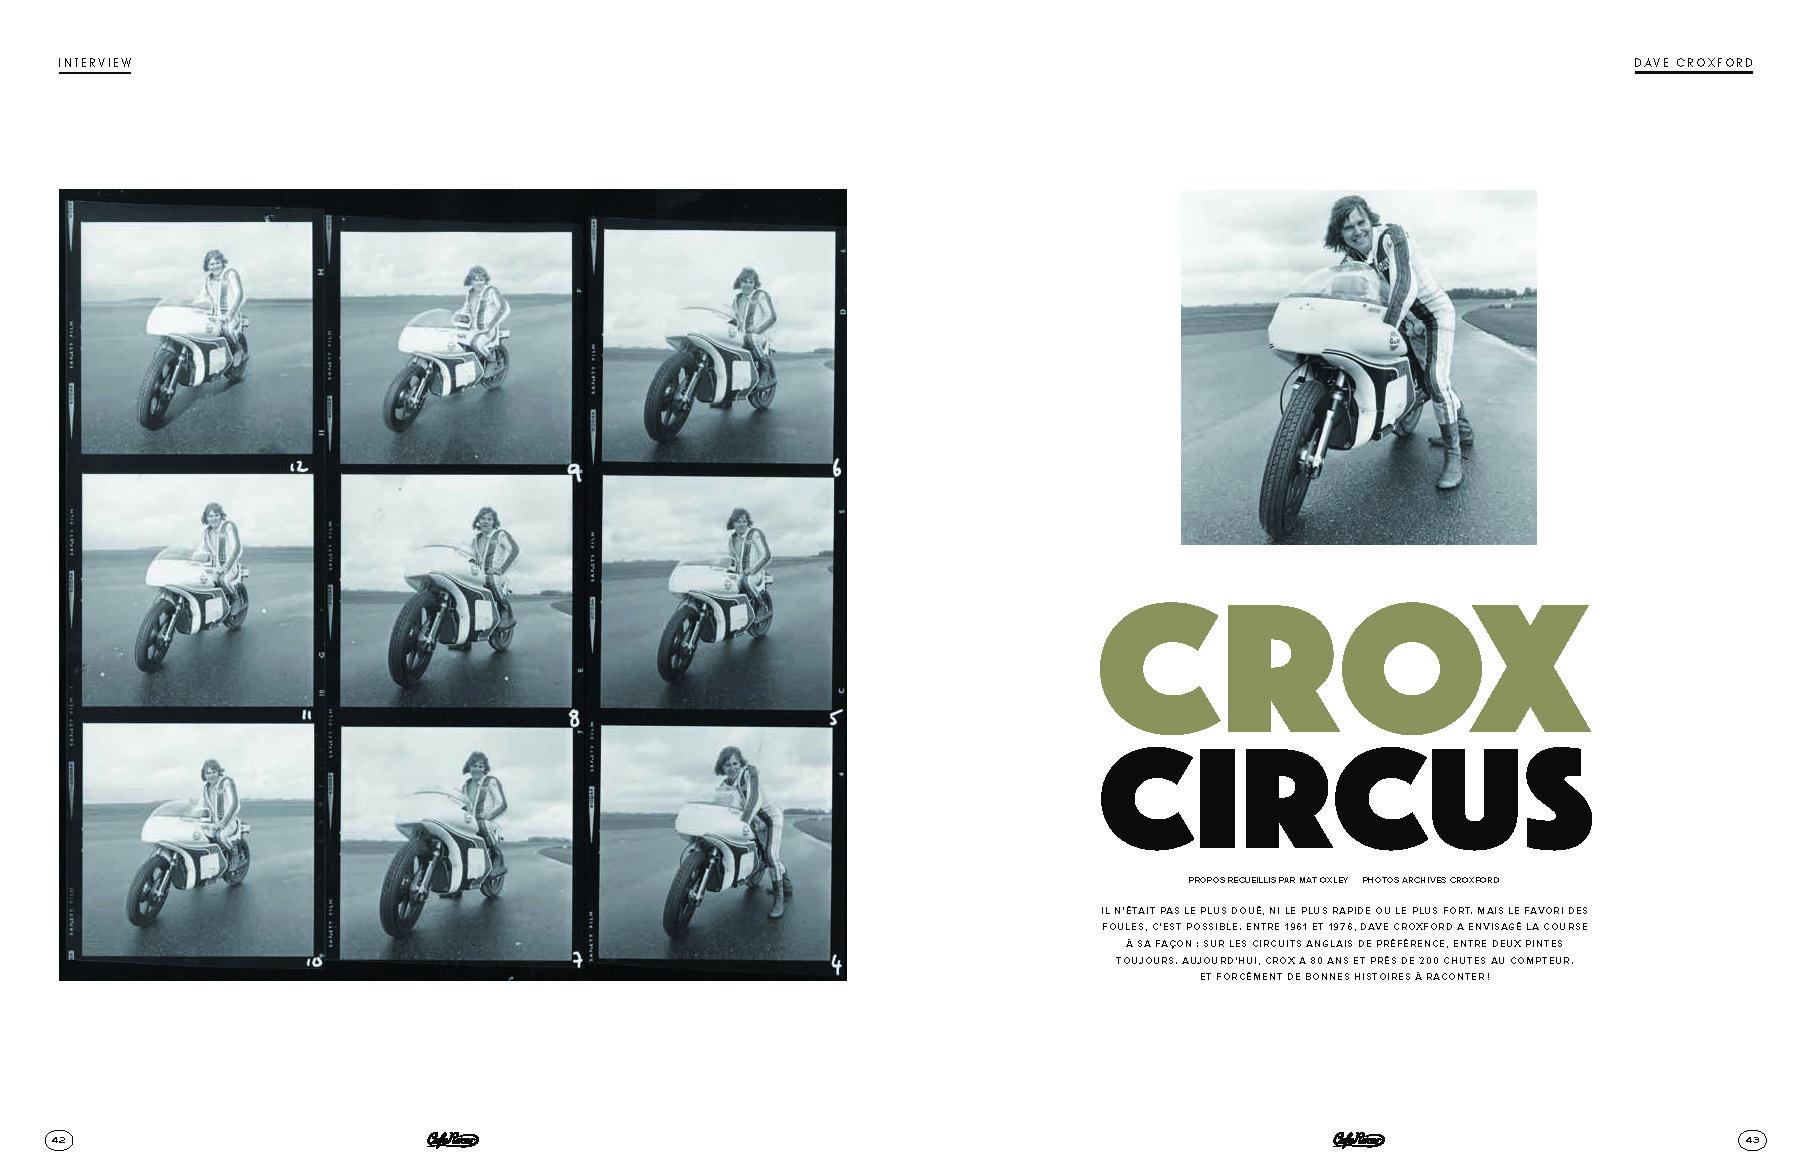 Dave Croxford, clown des circuits anglais.